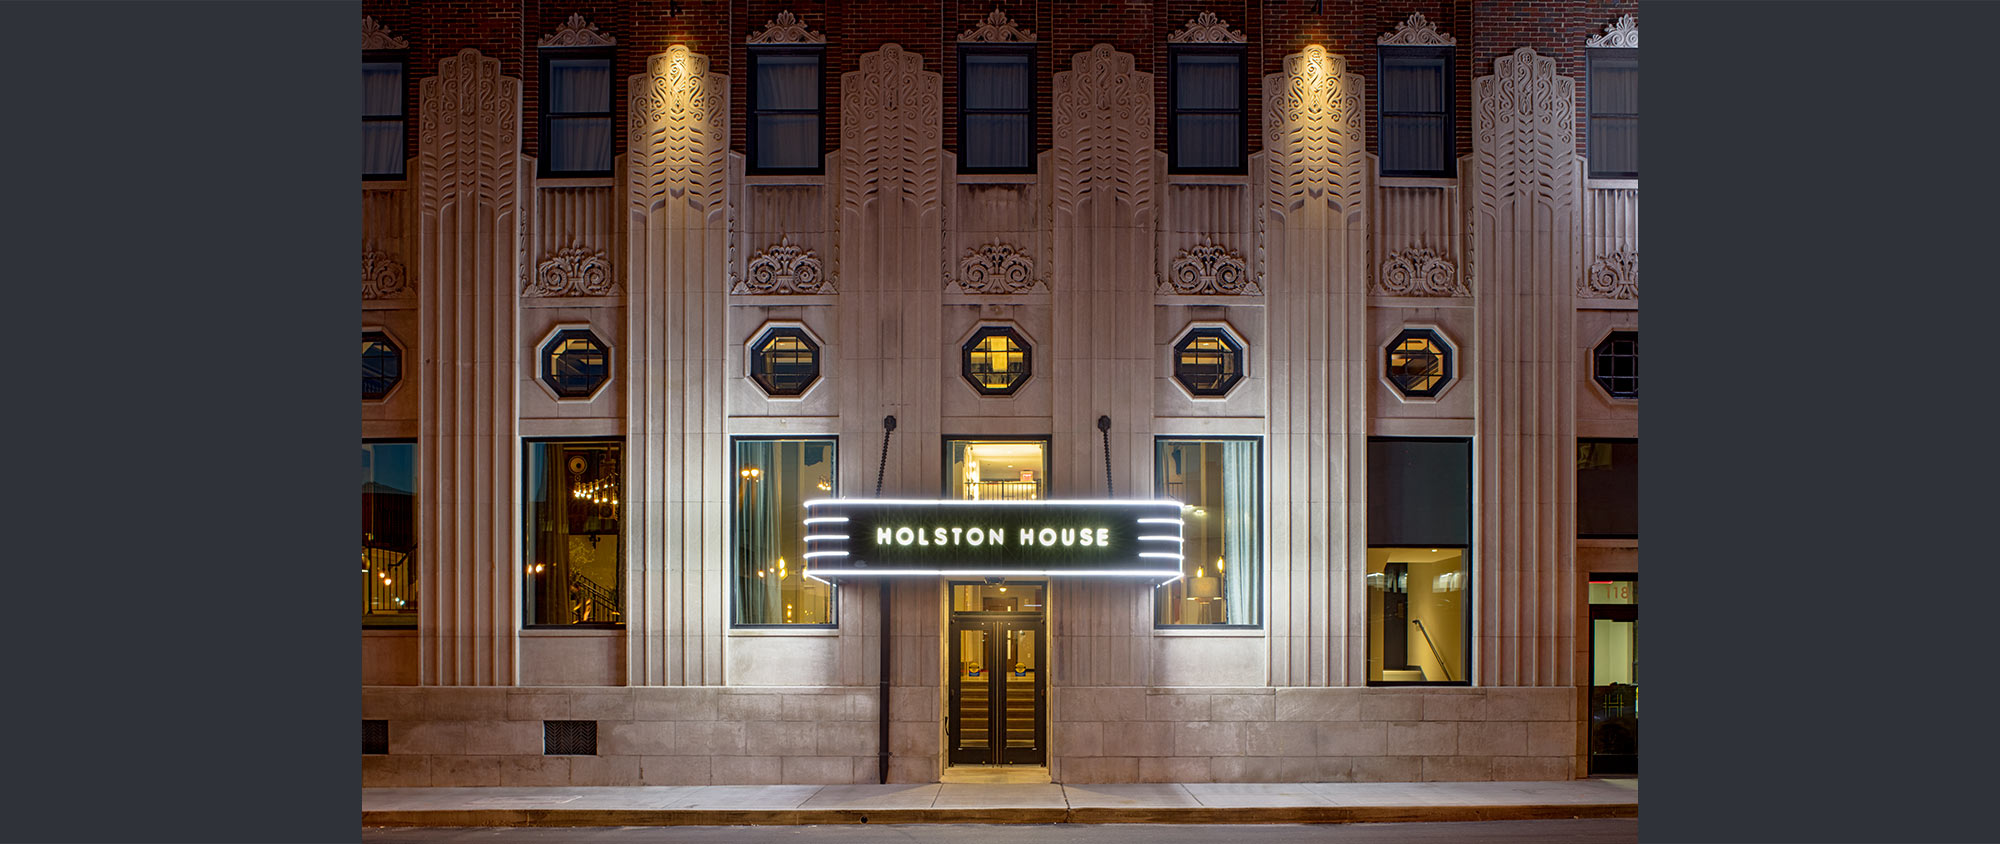 Holston House